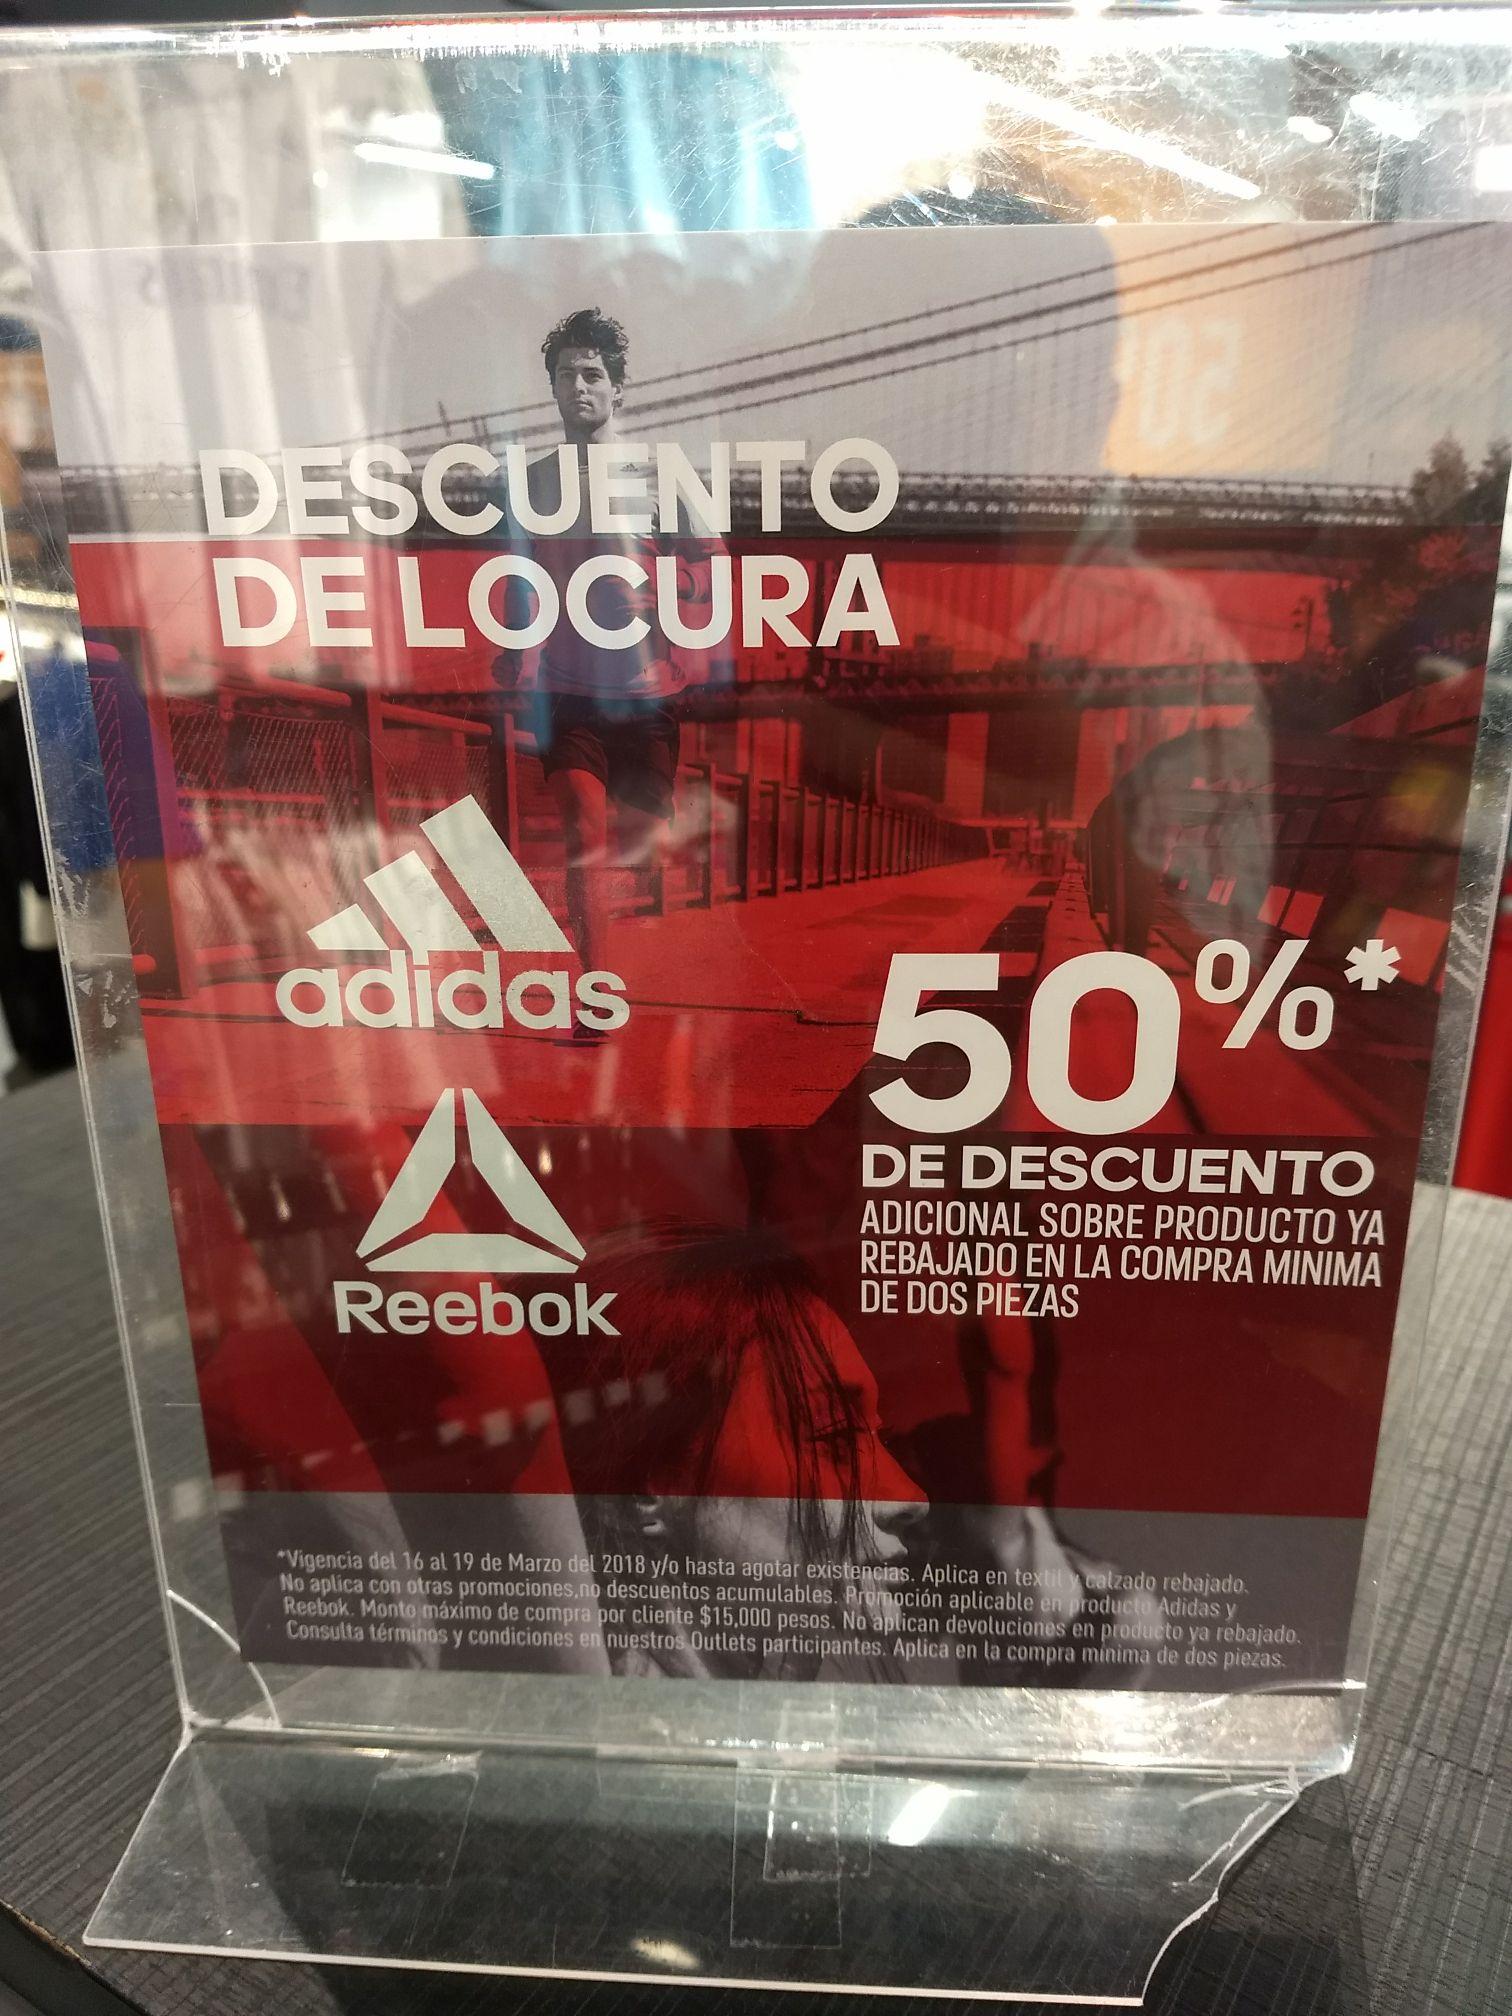 mercenario Motivar Matemático  Adidas Outlet plaza Central cdmx - promodescuentos.com